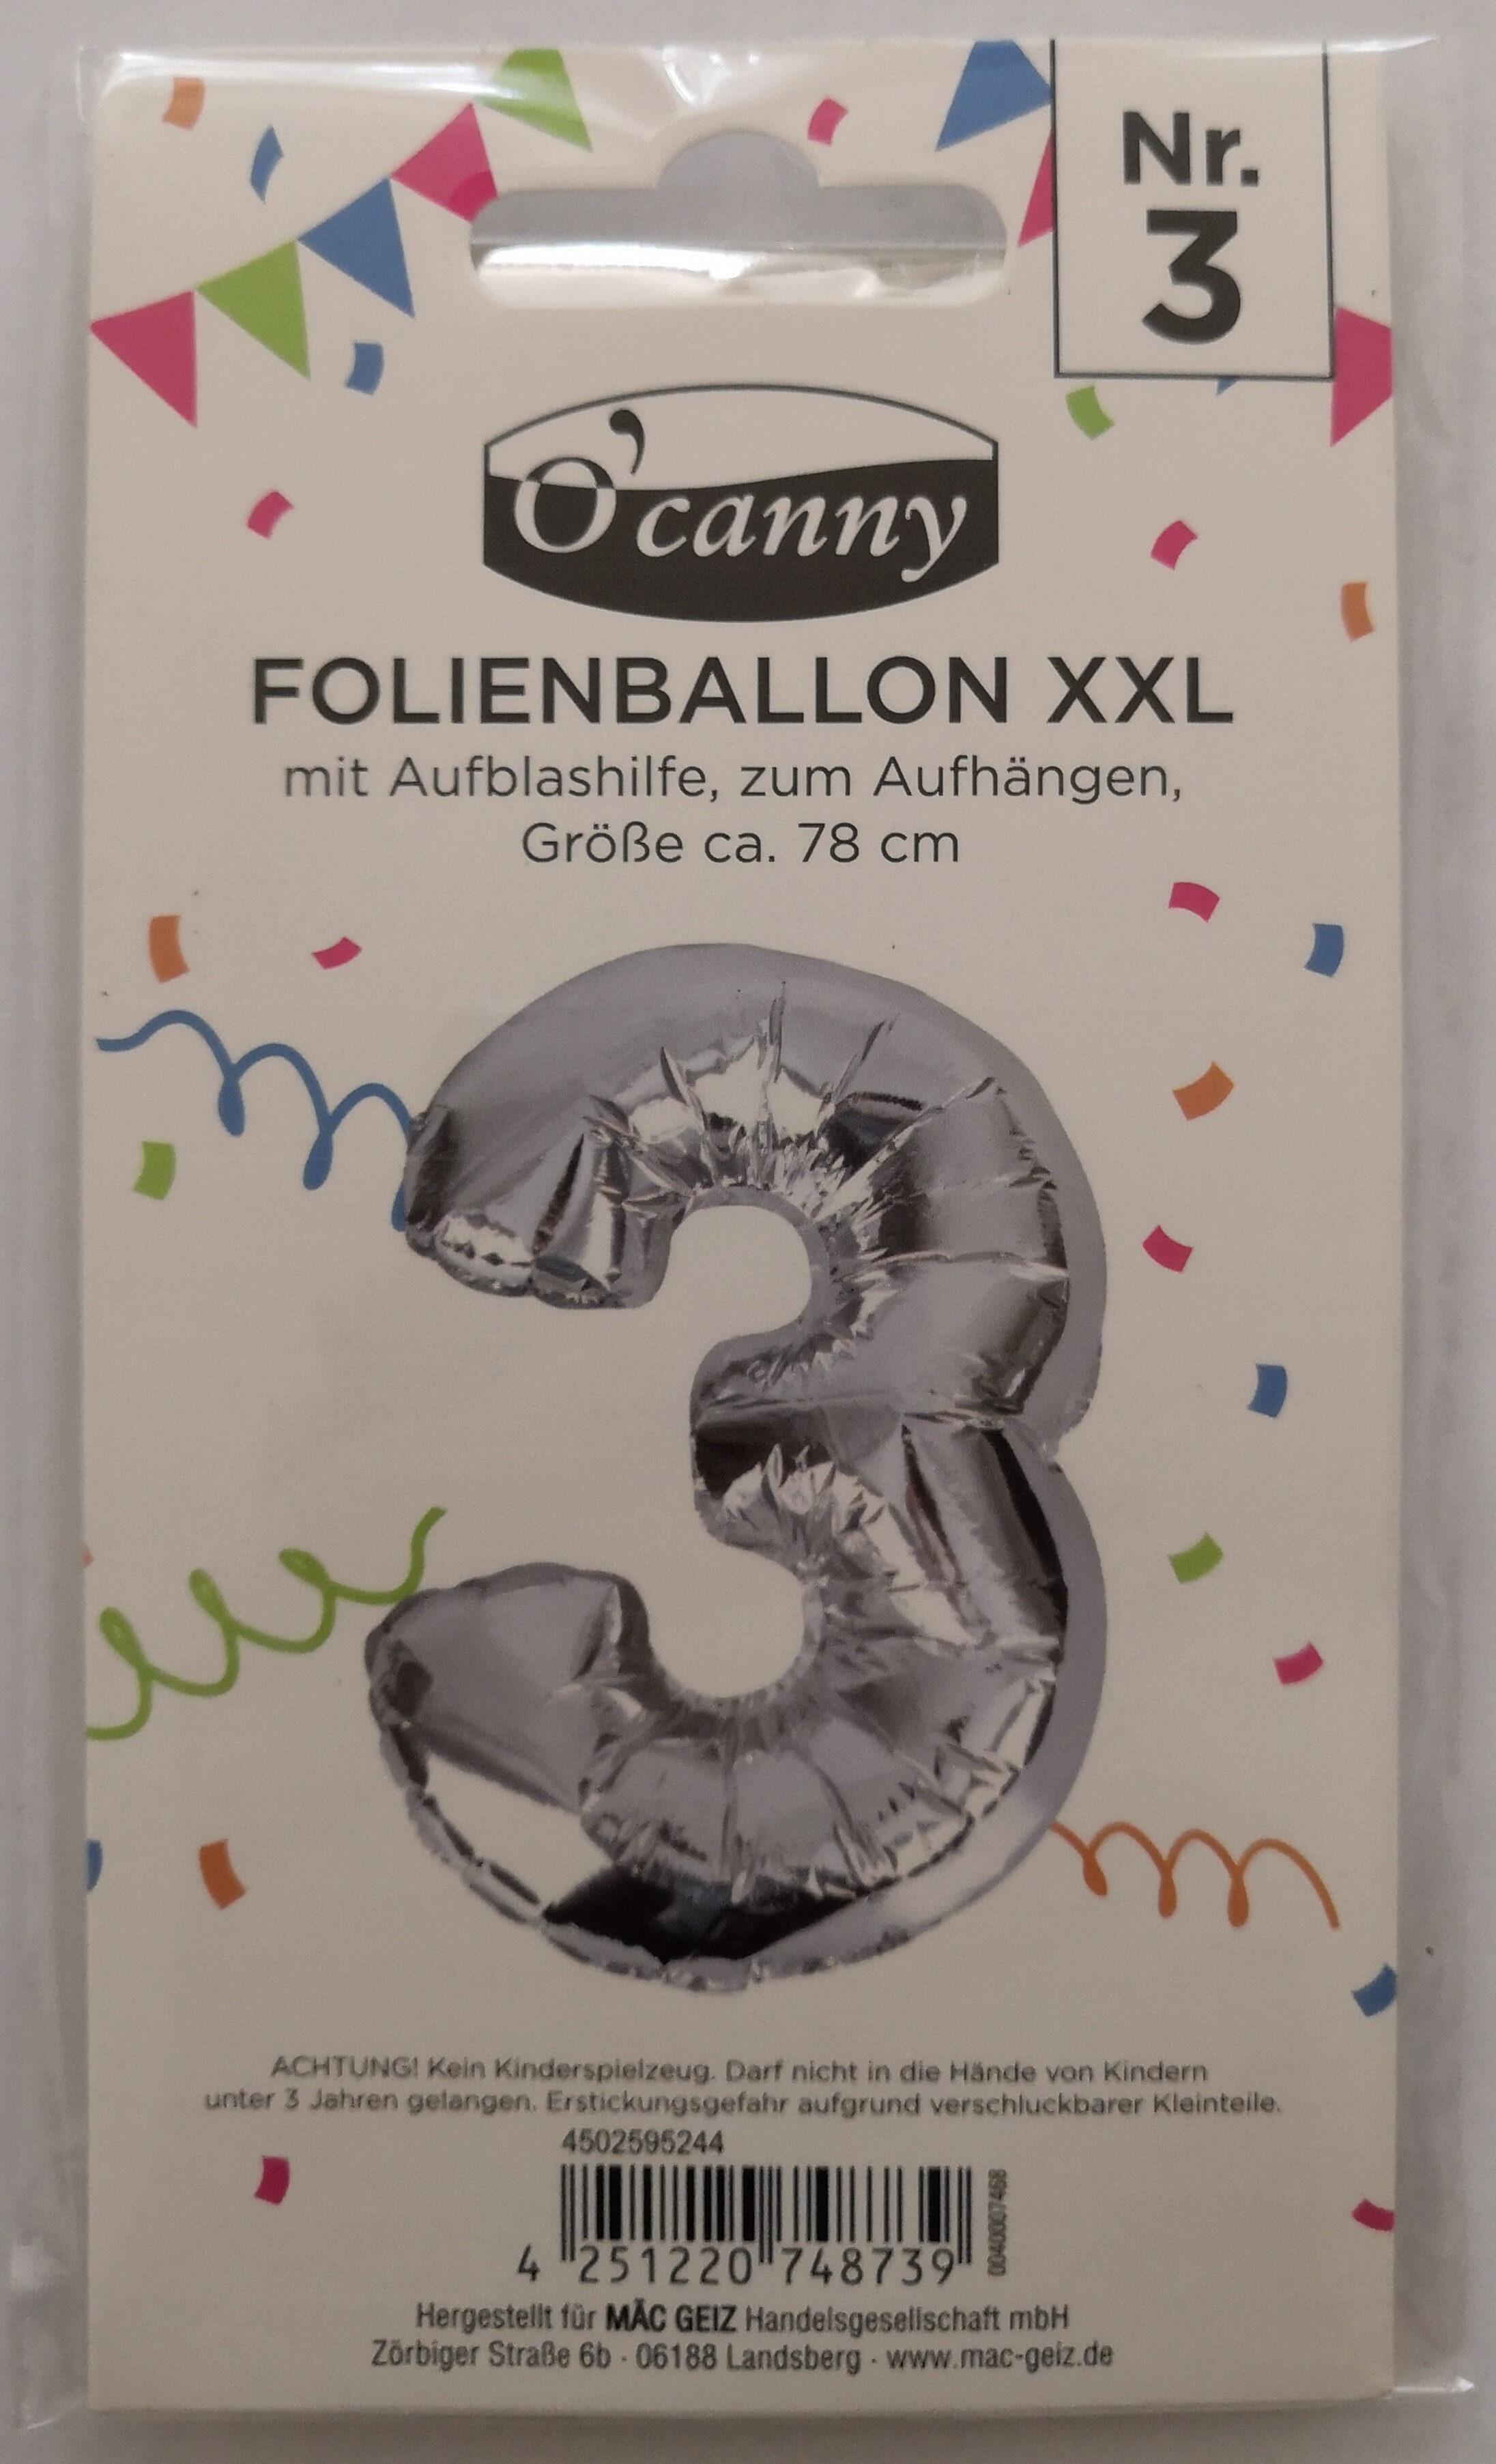 Folienballon XXL - Product - de